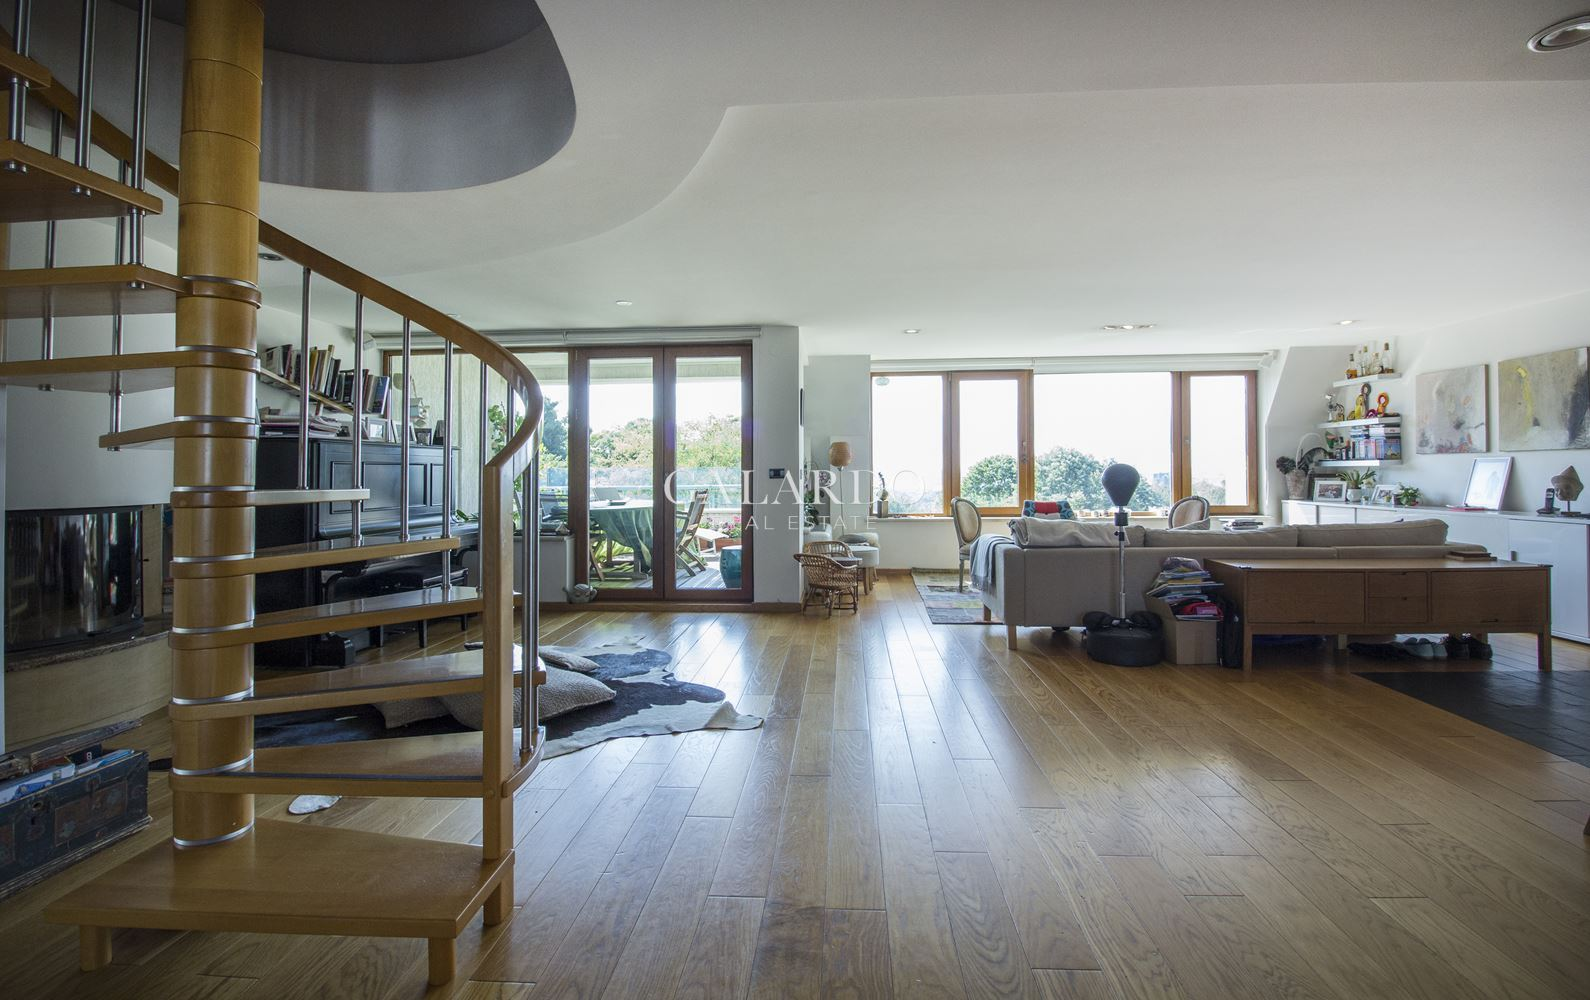 Unique penthouse with breathtaking Vitosha, South Park and Sofia views